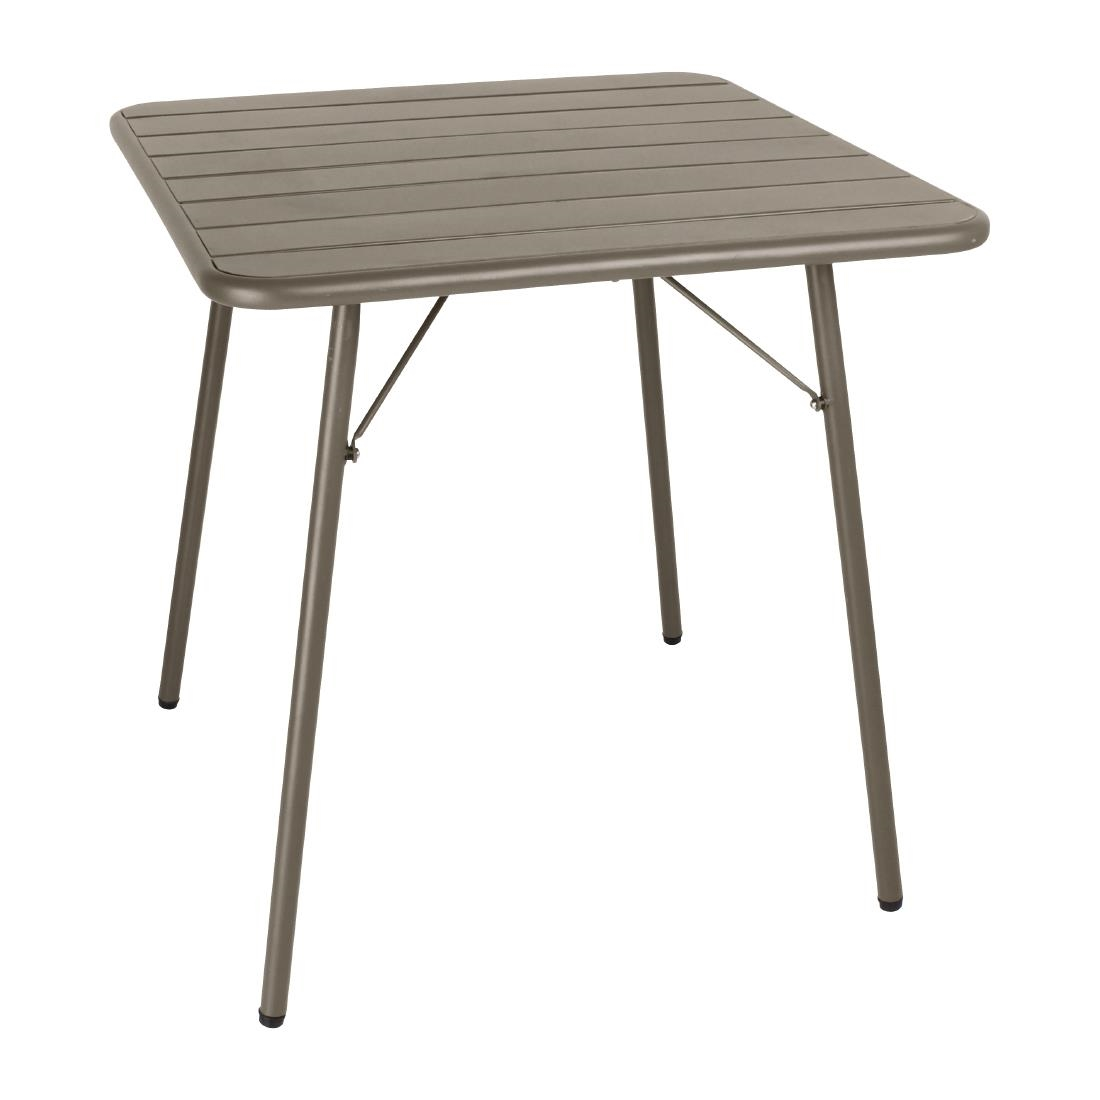 Slatted Steel Table - Coffee